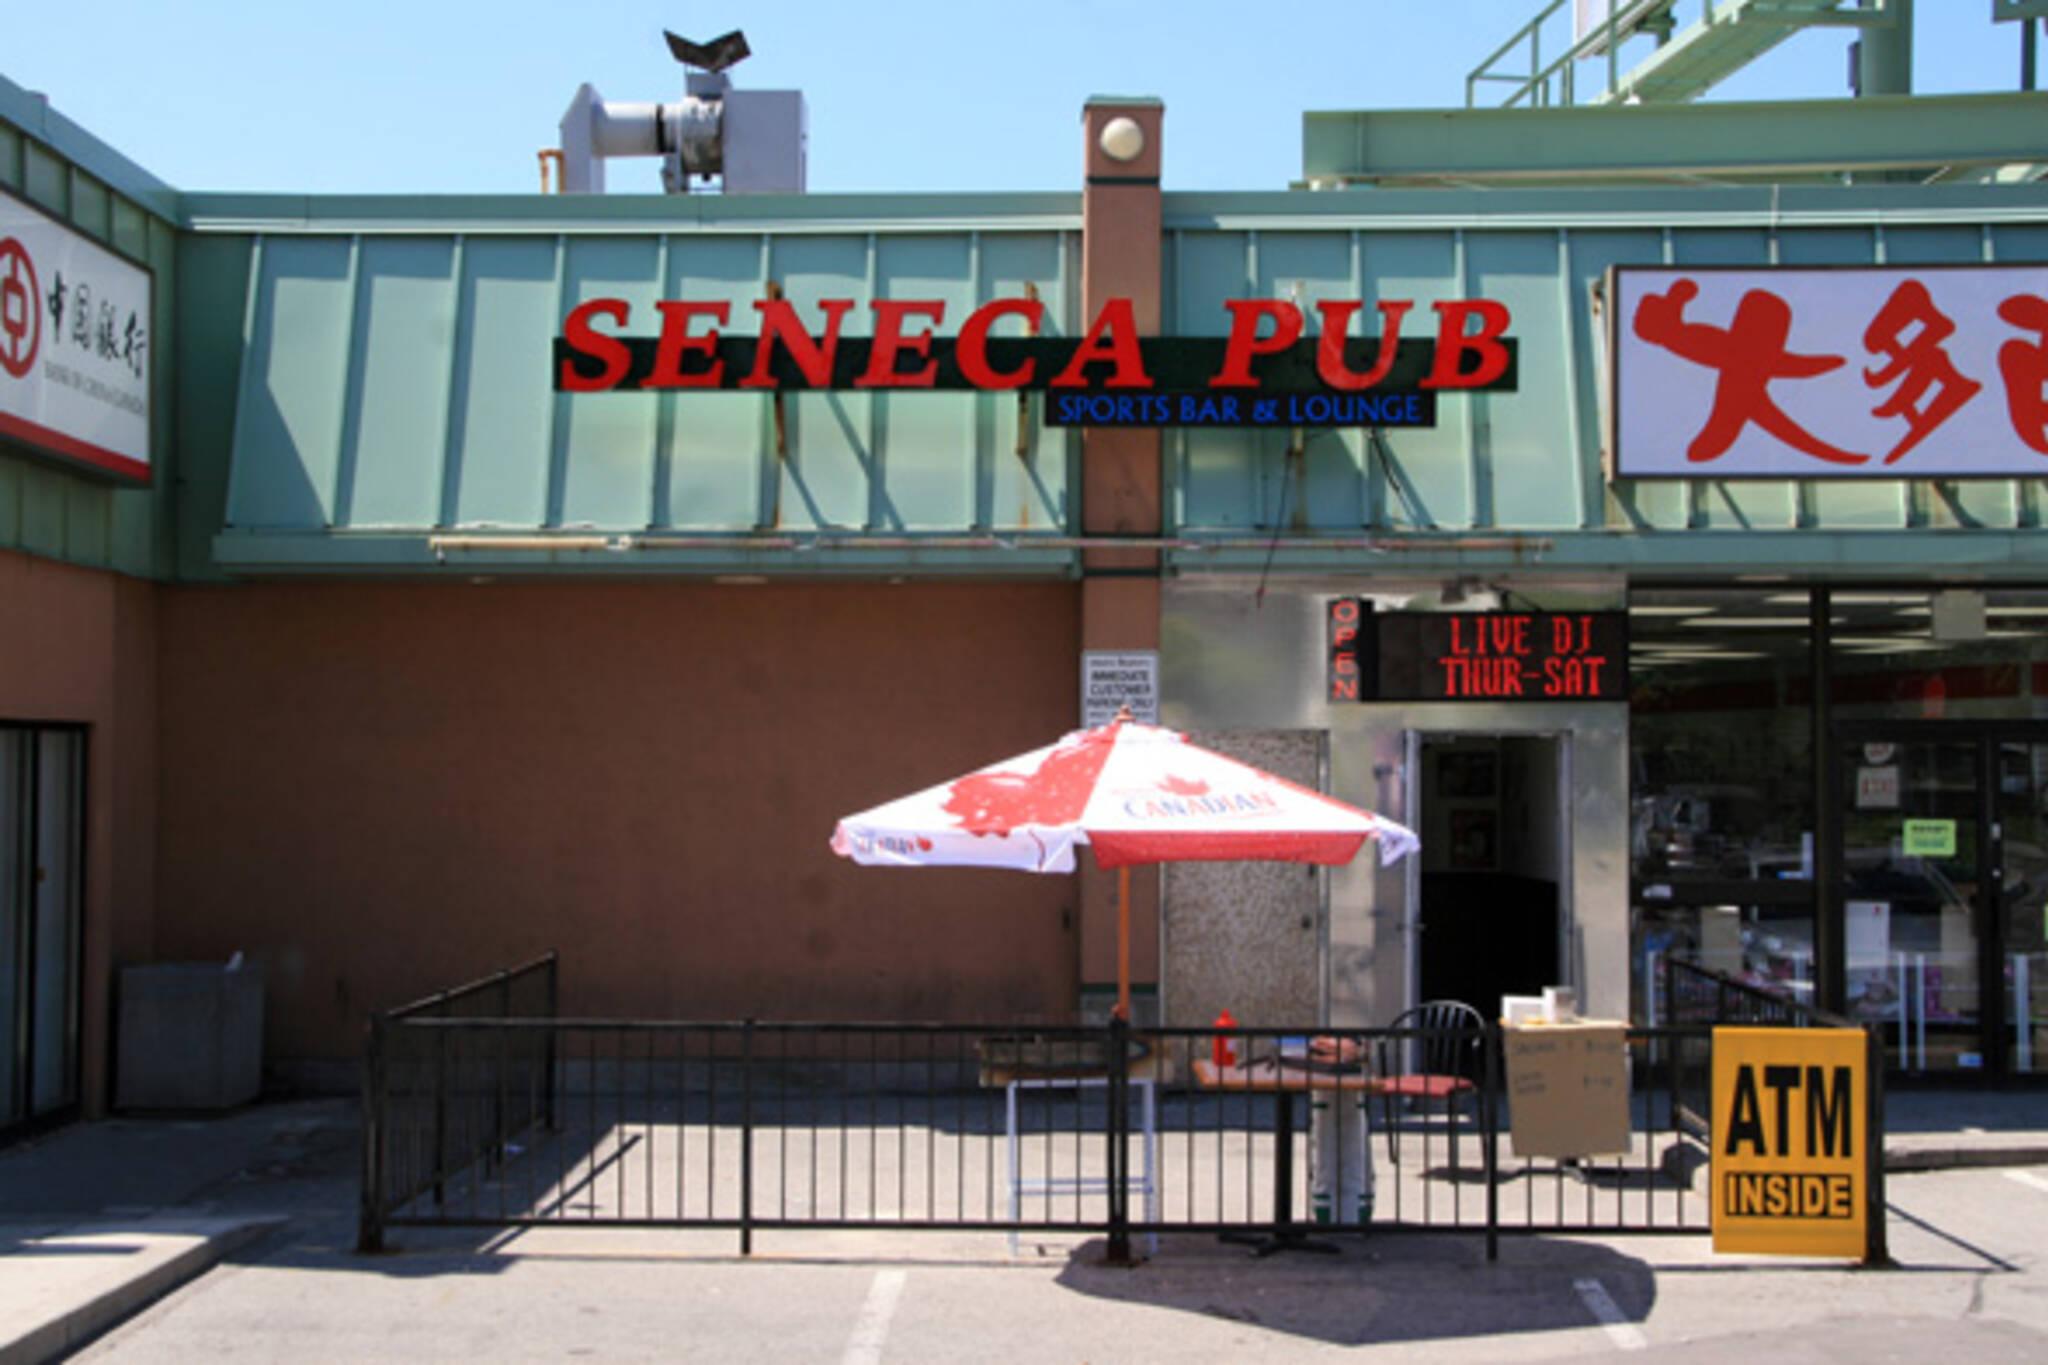 Seneca Pub